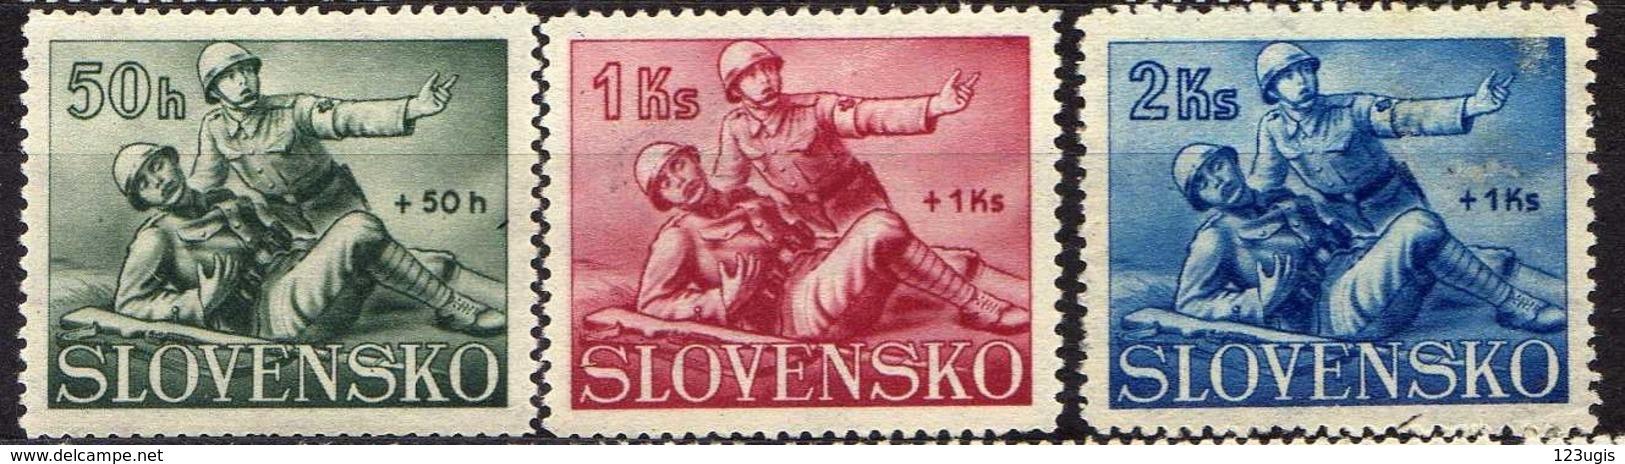 Slowakei / Slovakia, 1941, Mi 88-90 *  [060419XXV] - Slovakia